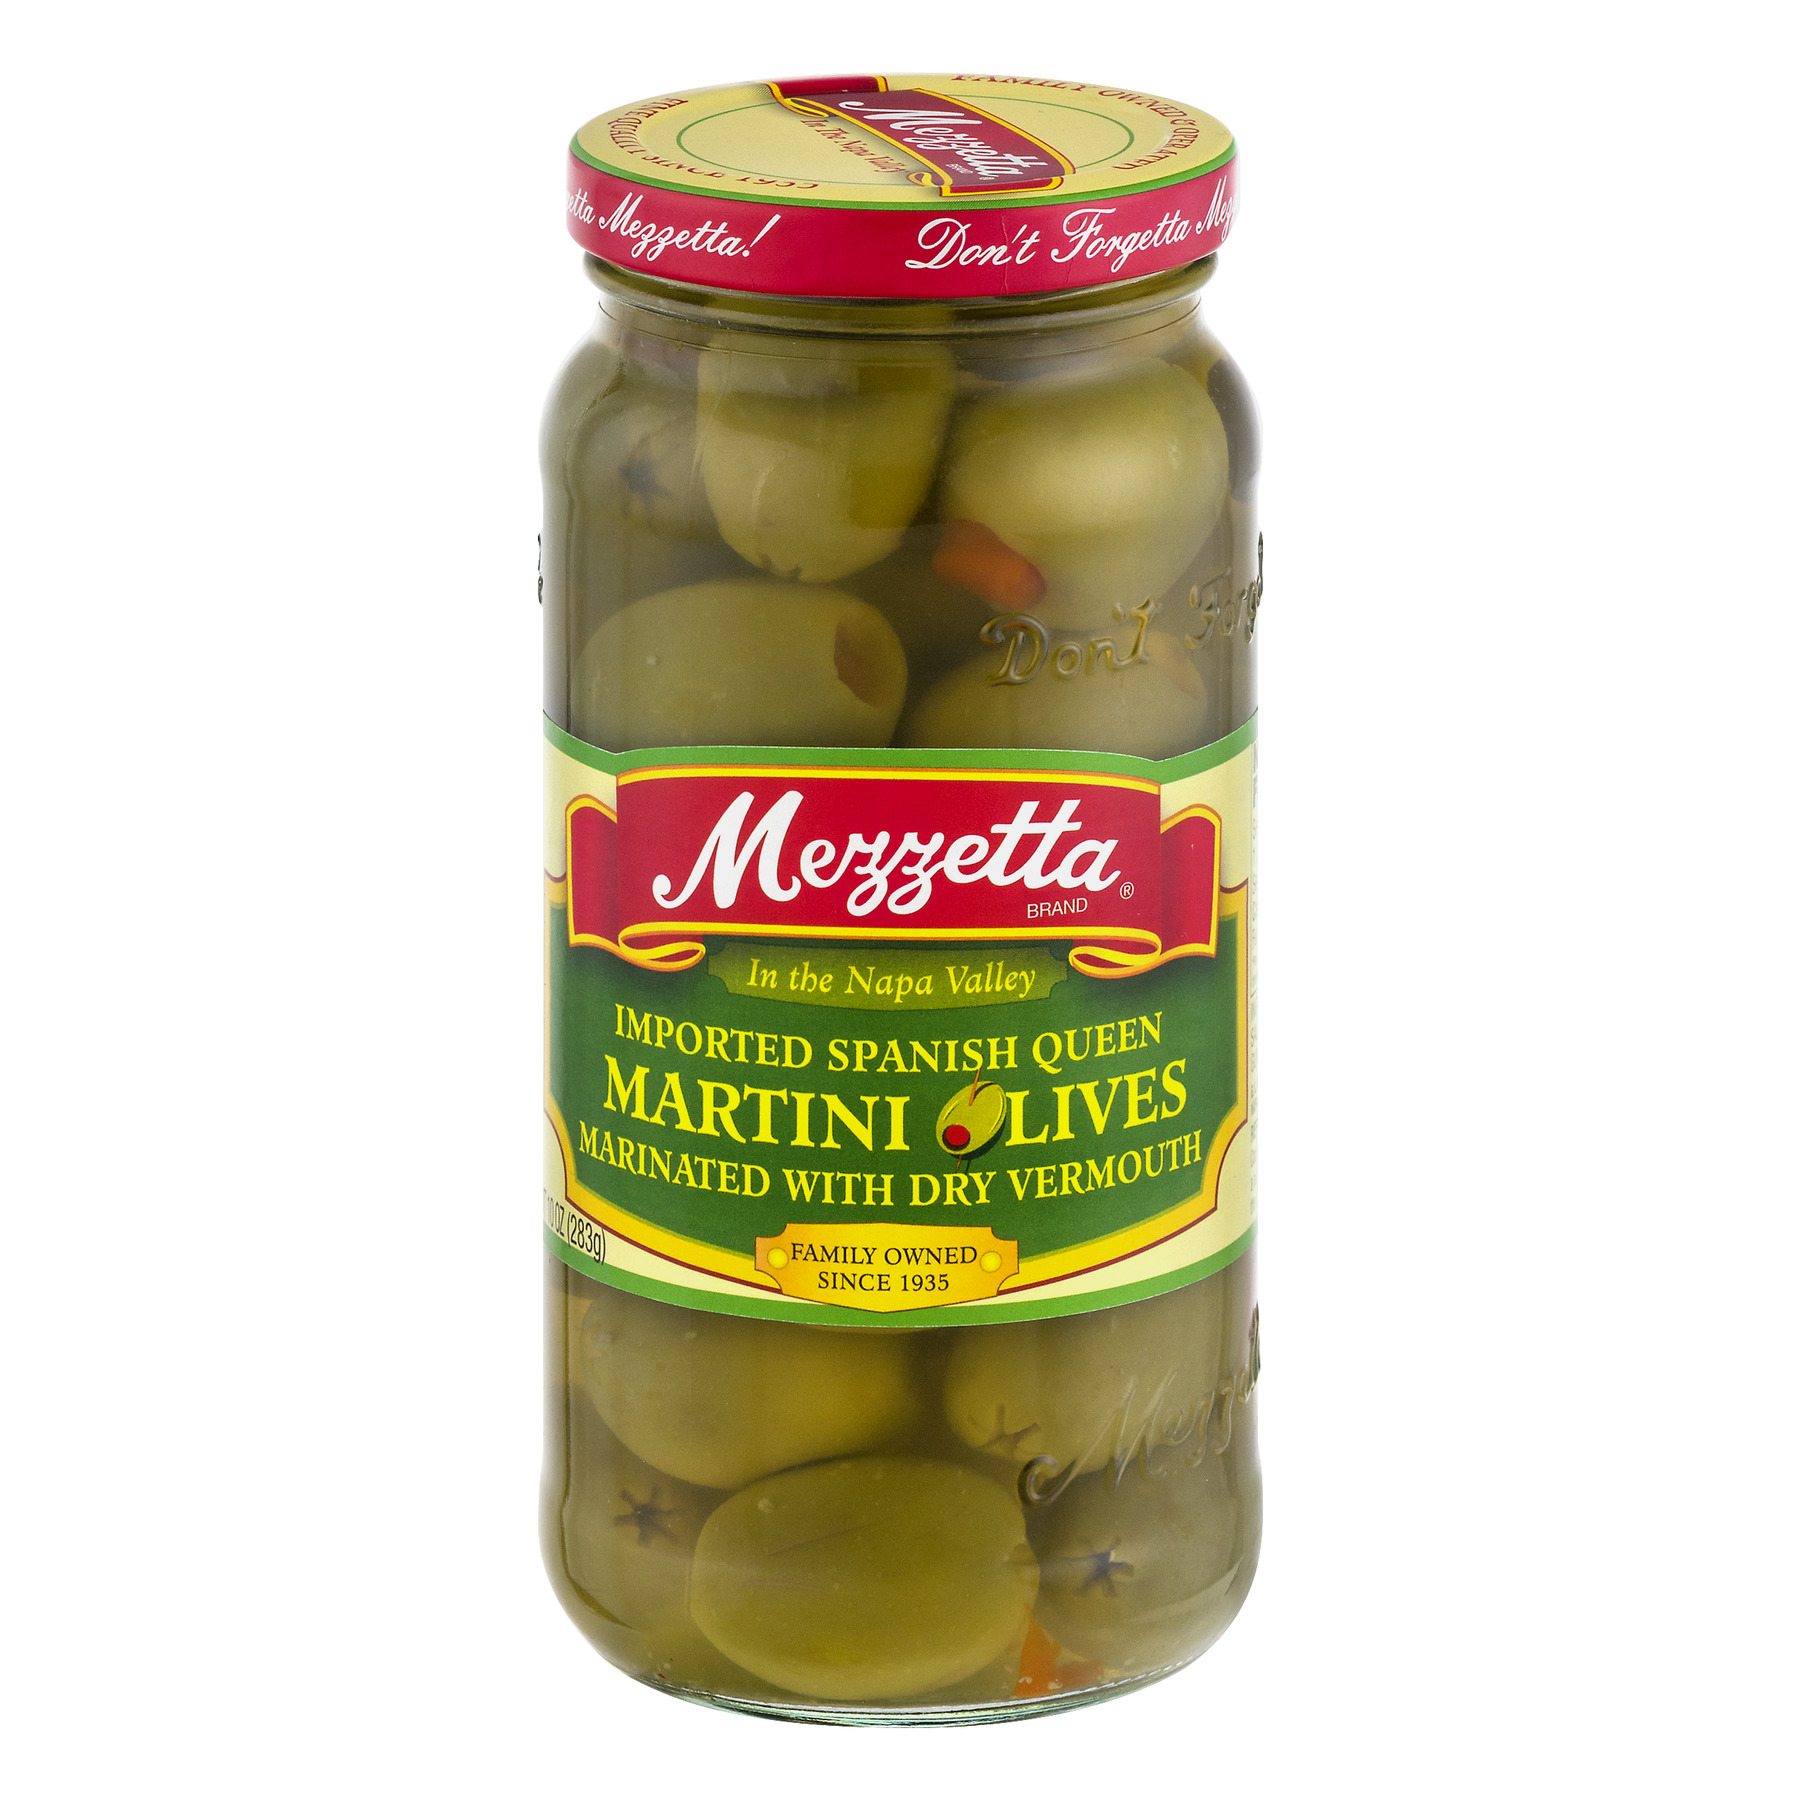 (2 Pack) Mezzetta Imported Spanish Queen Martini Olives, 10 oz